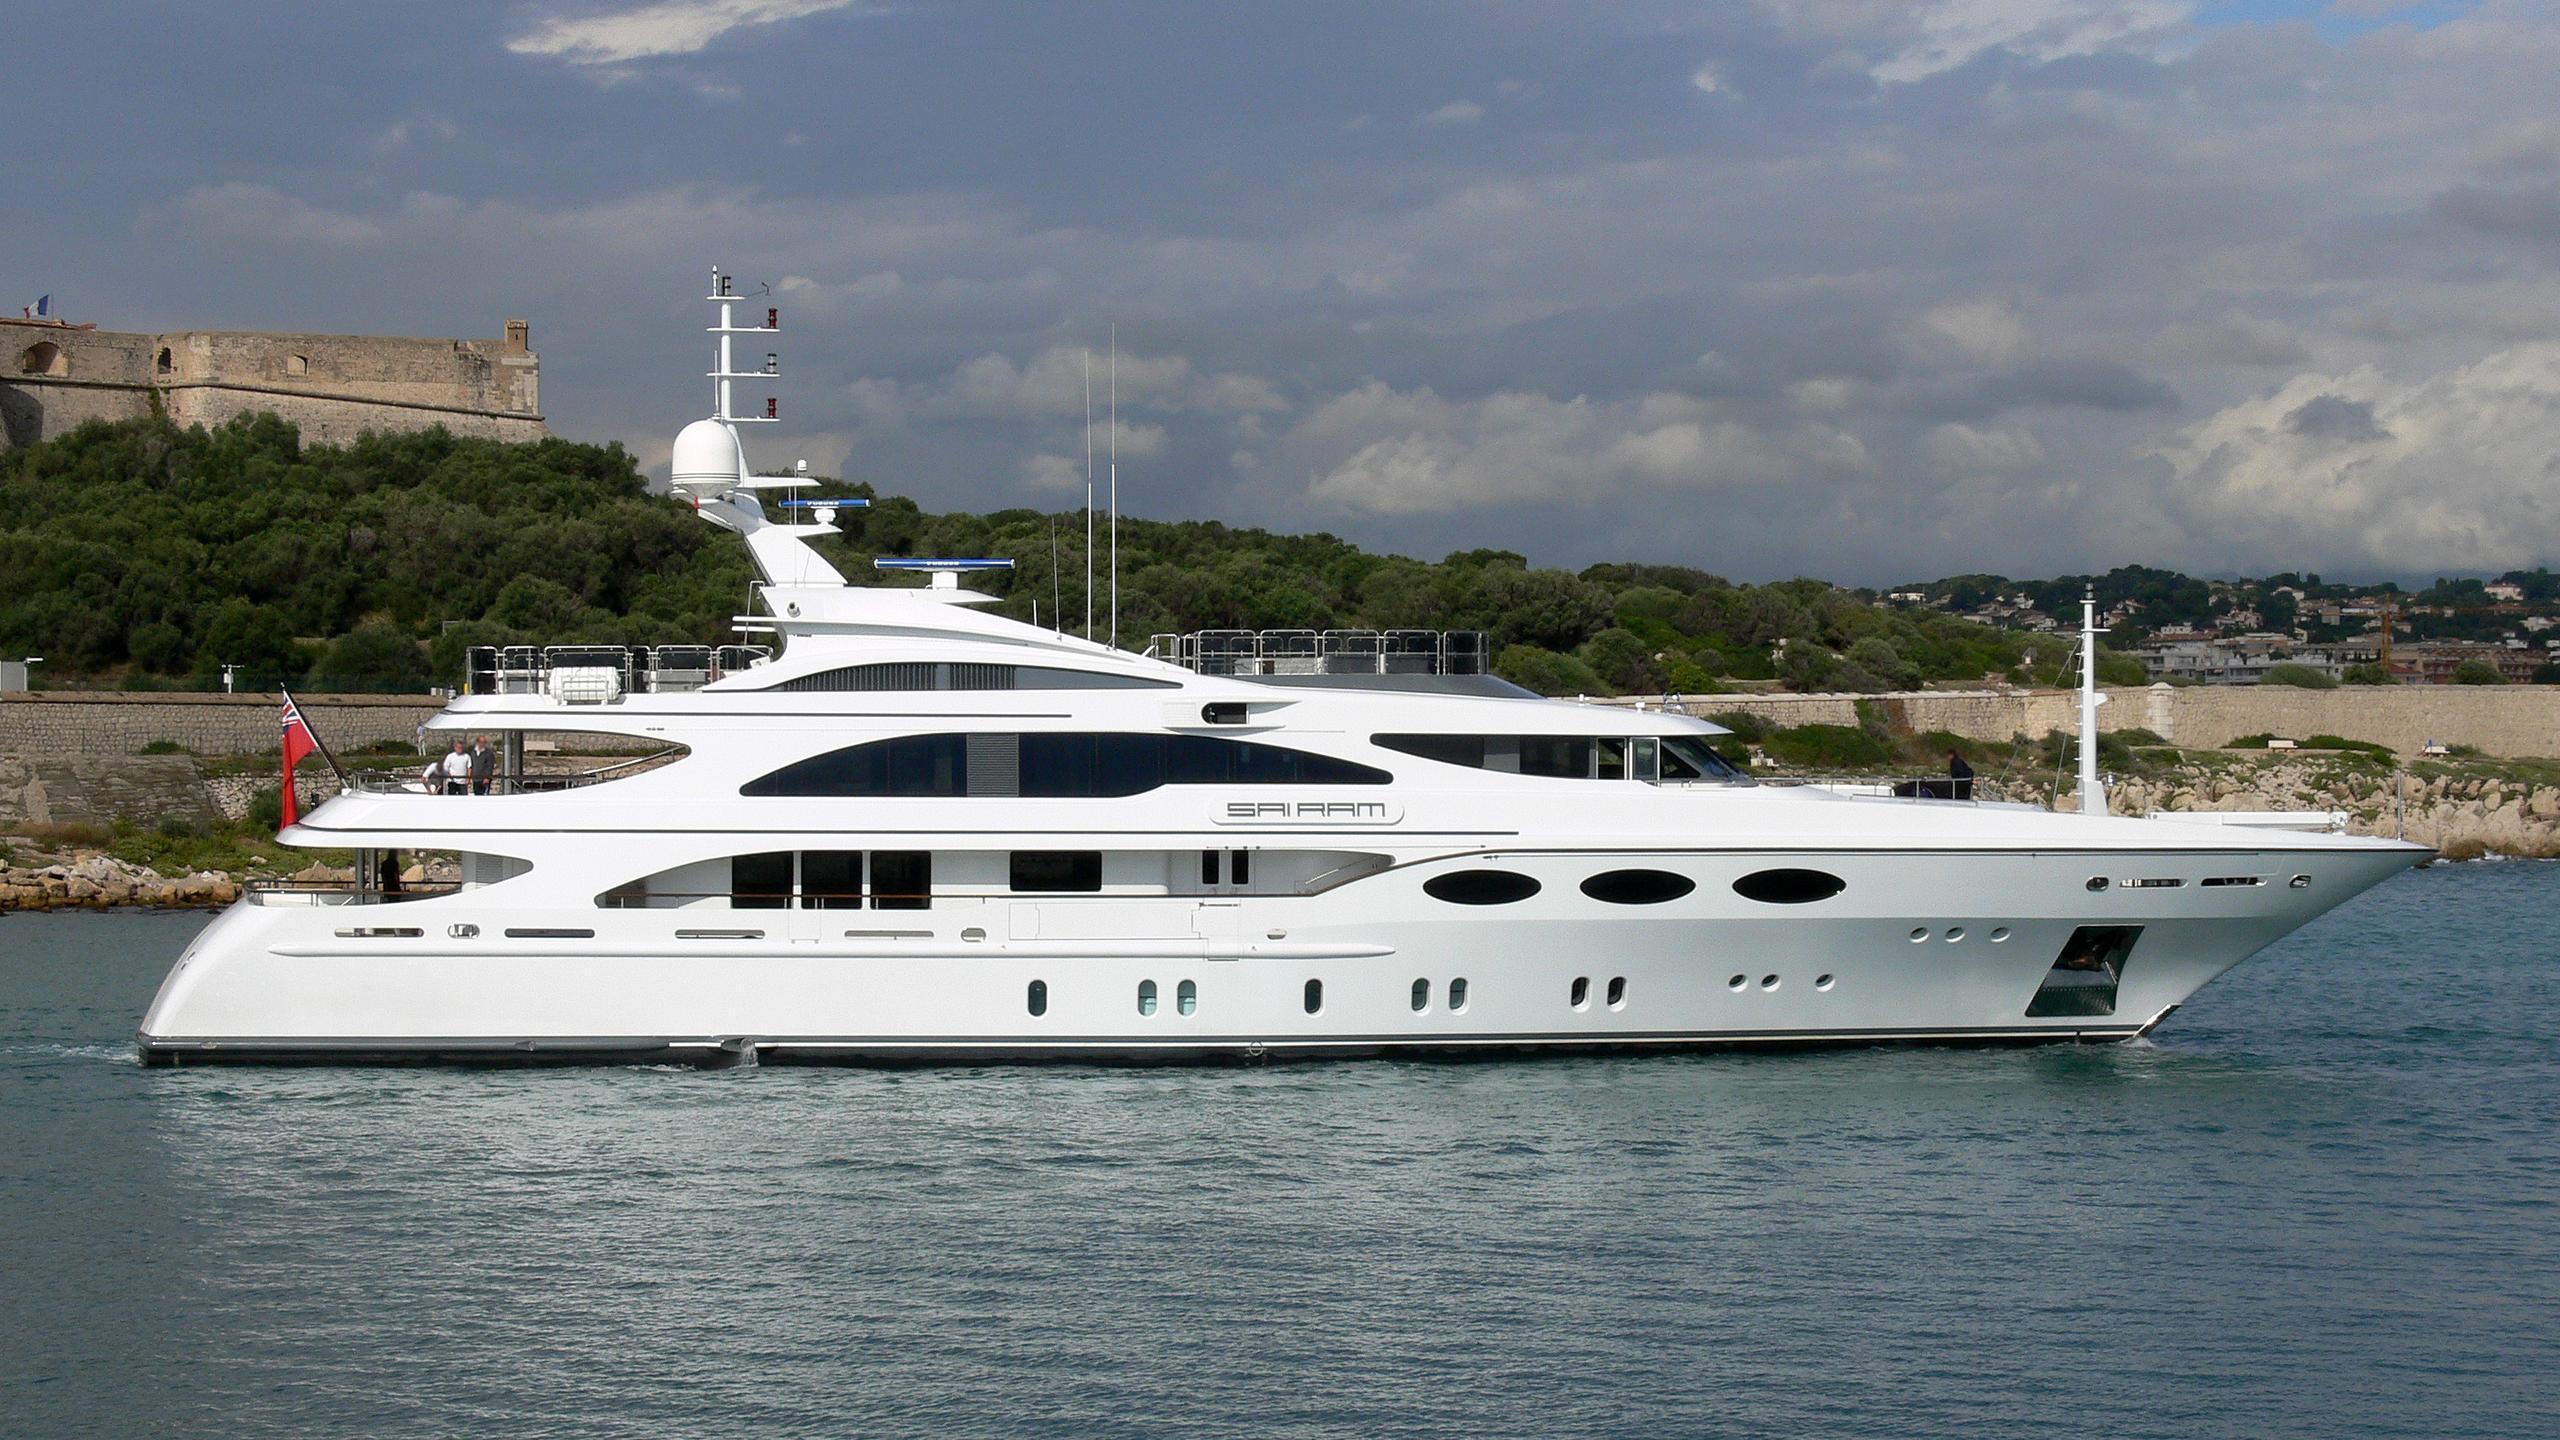 my-falcon-sai-ram-motor-yacht-benetti-2004-52m-profile